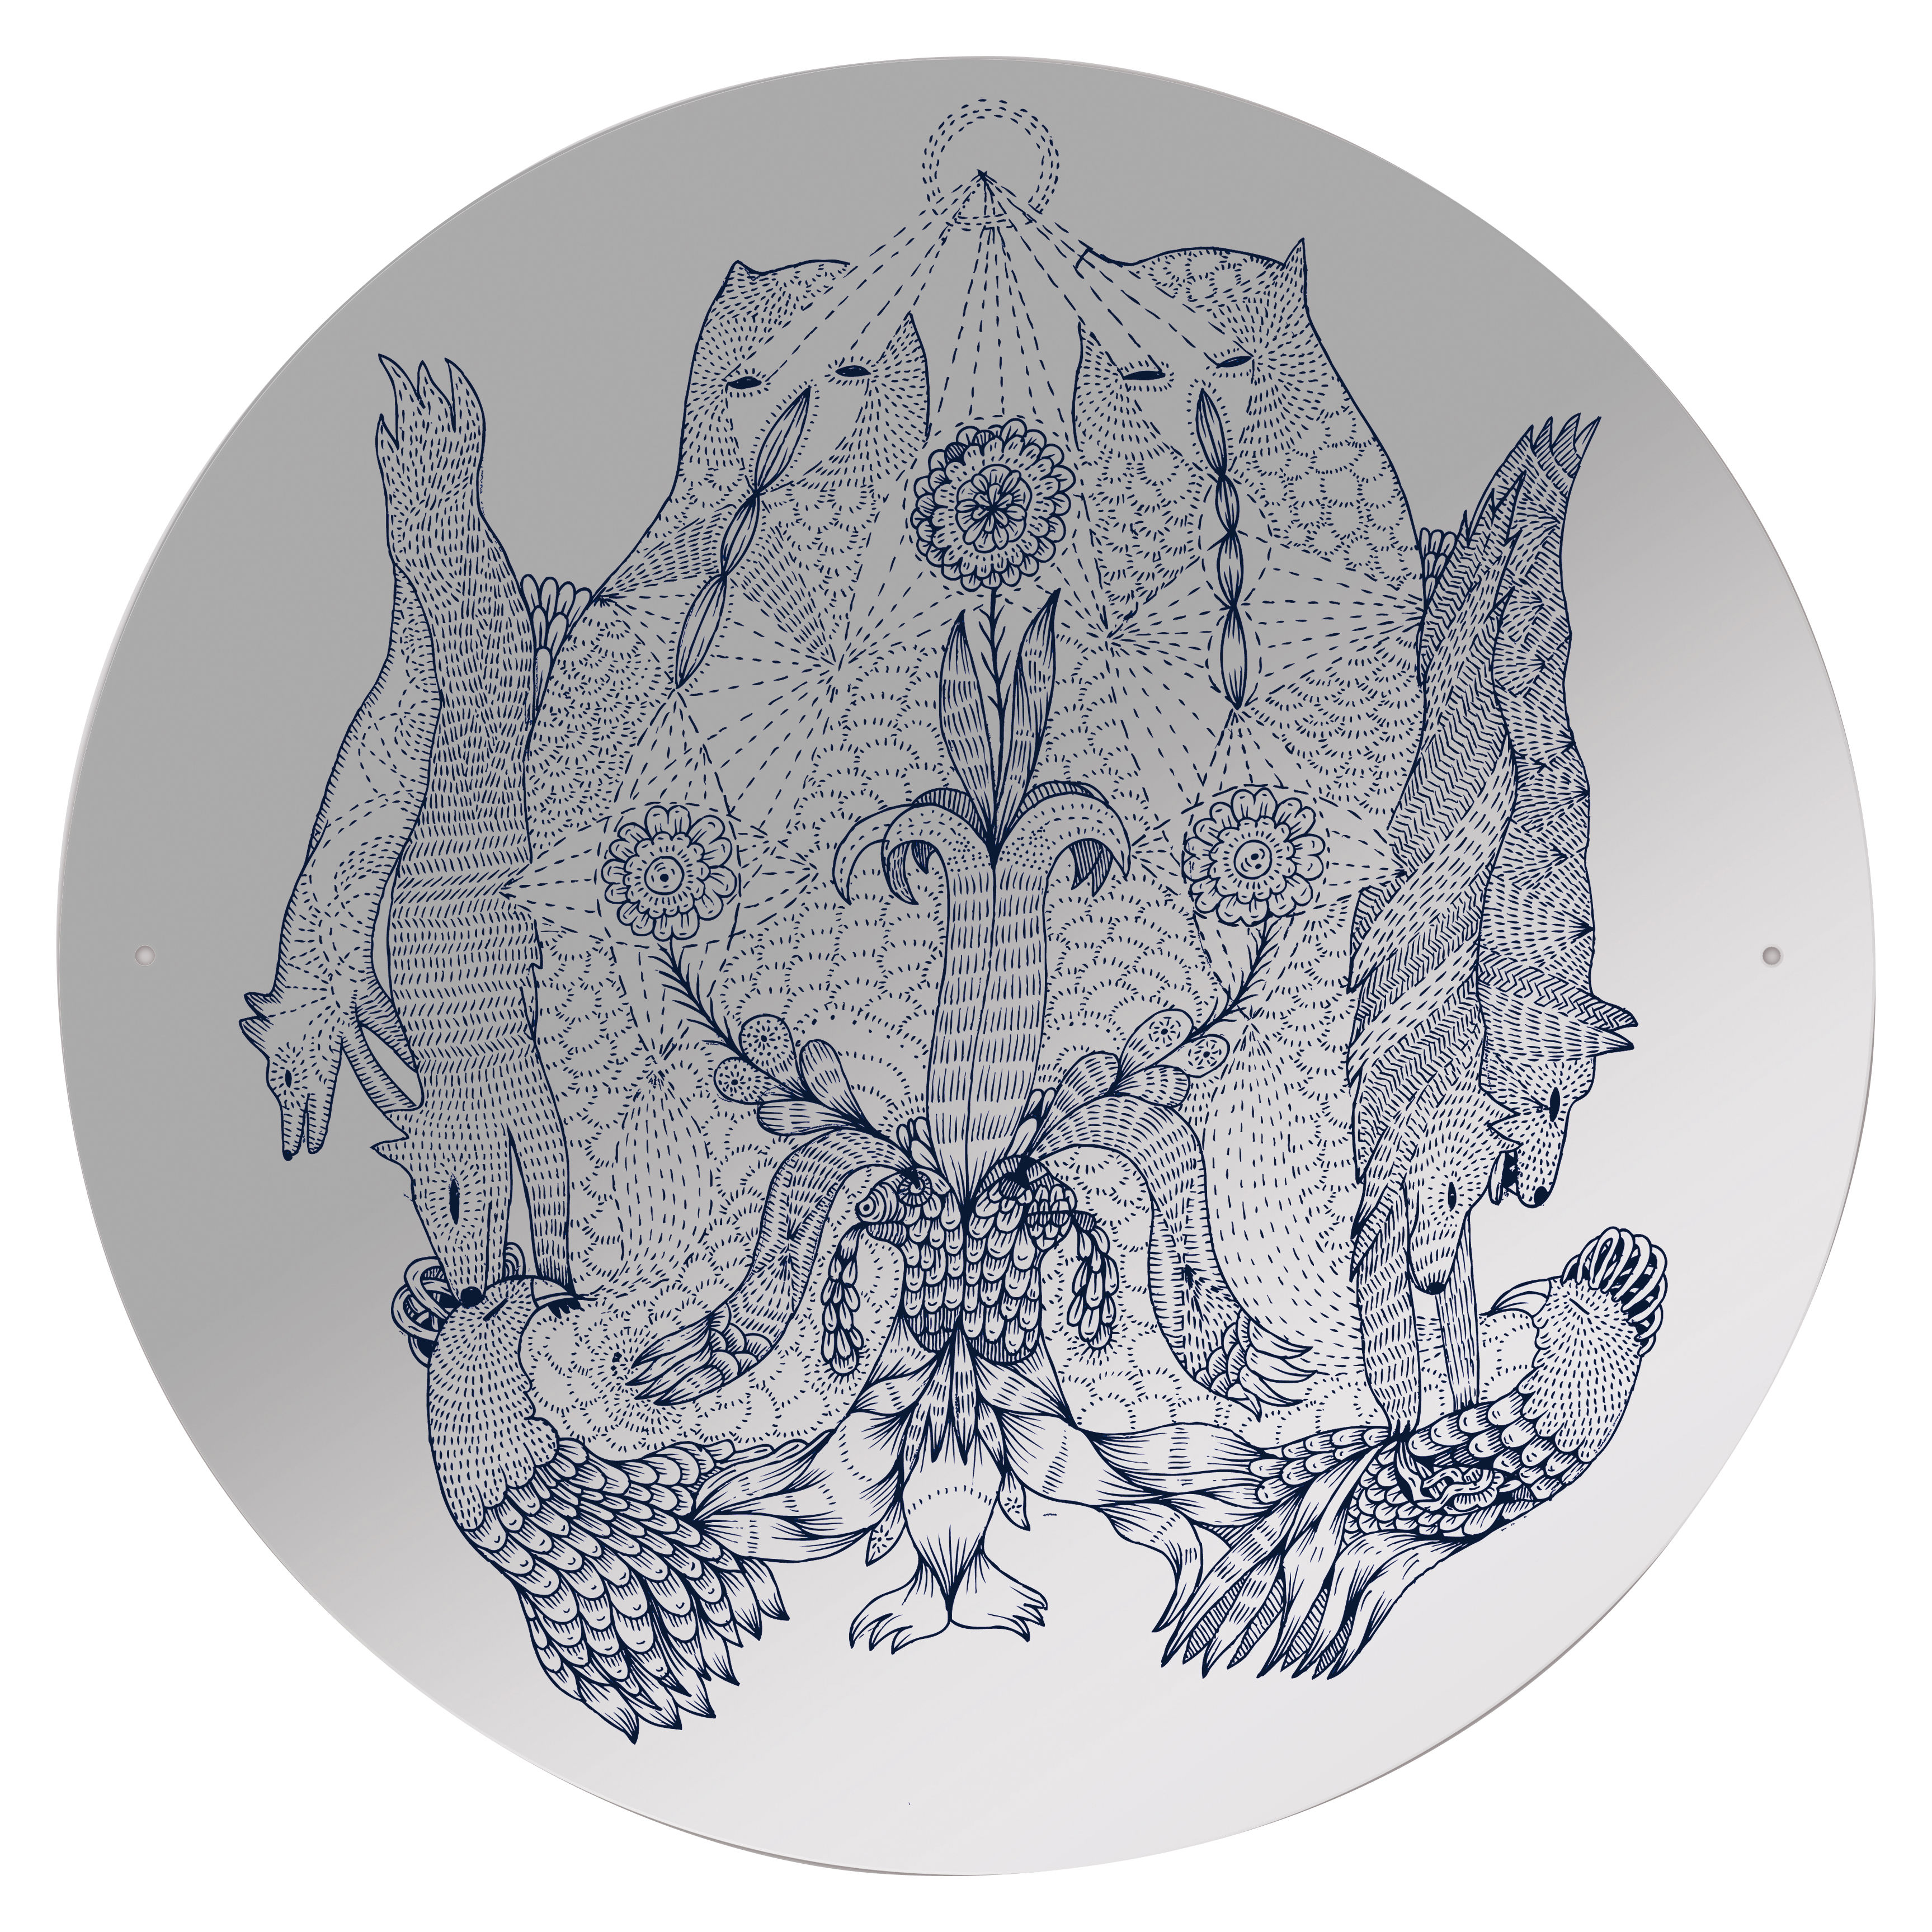 Furniture - Mirrors - Rarara self-sticking mirror - Self-adhesive by Domestic - Rarara pattern - Plastic material